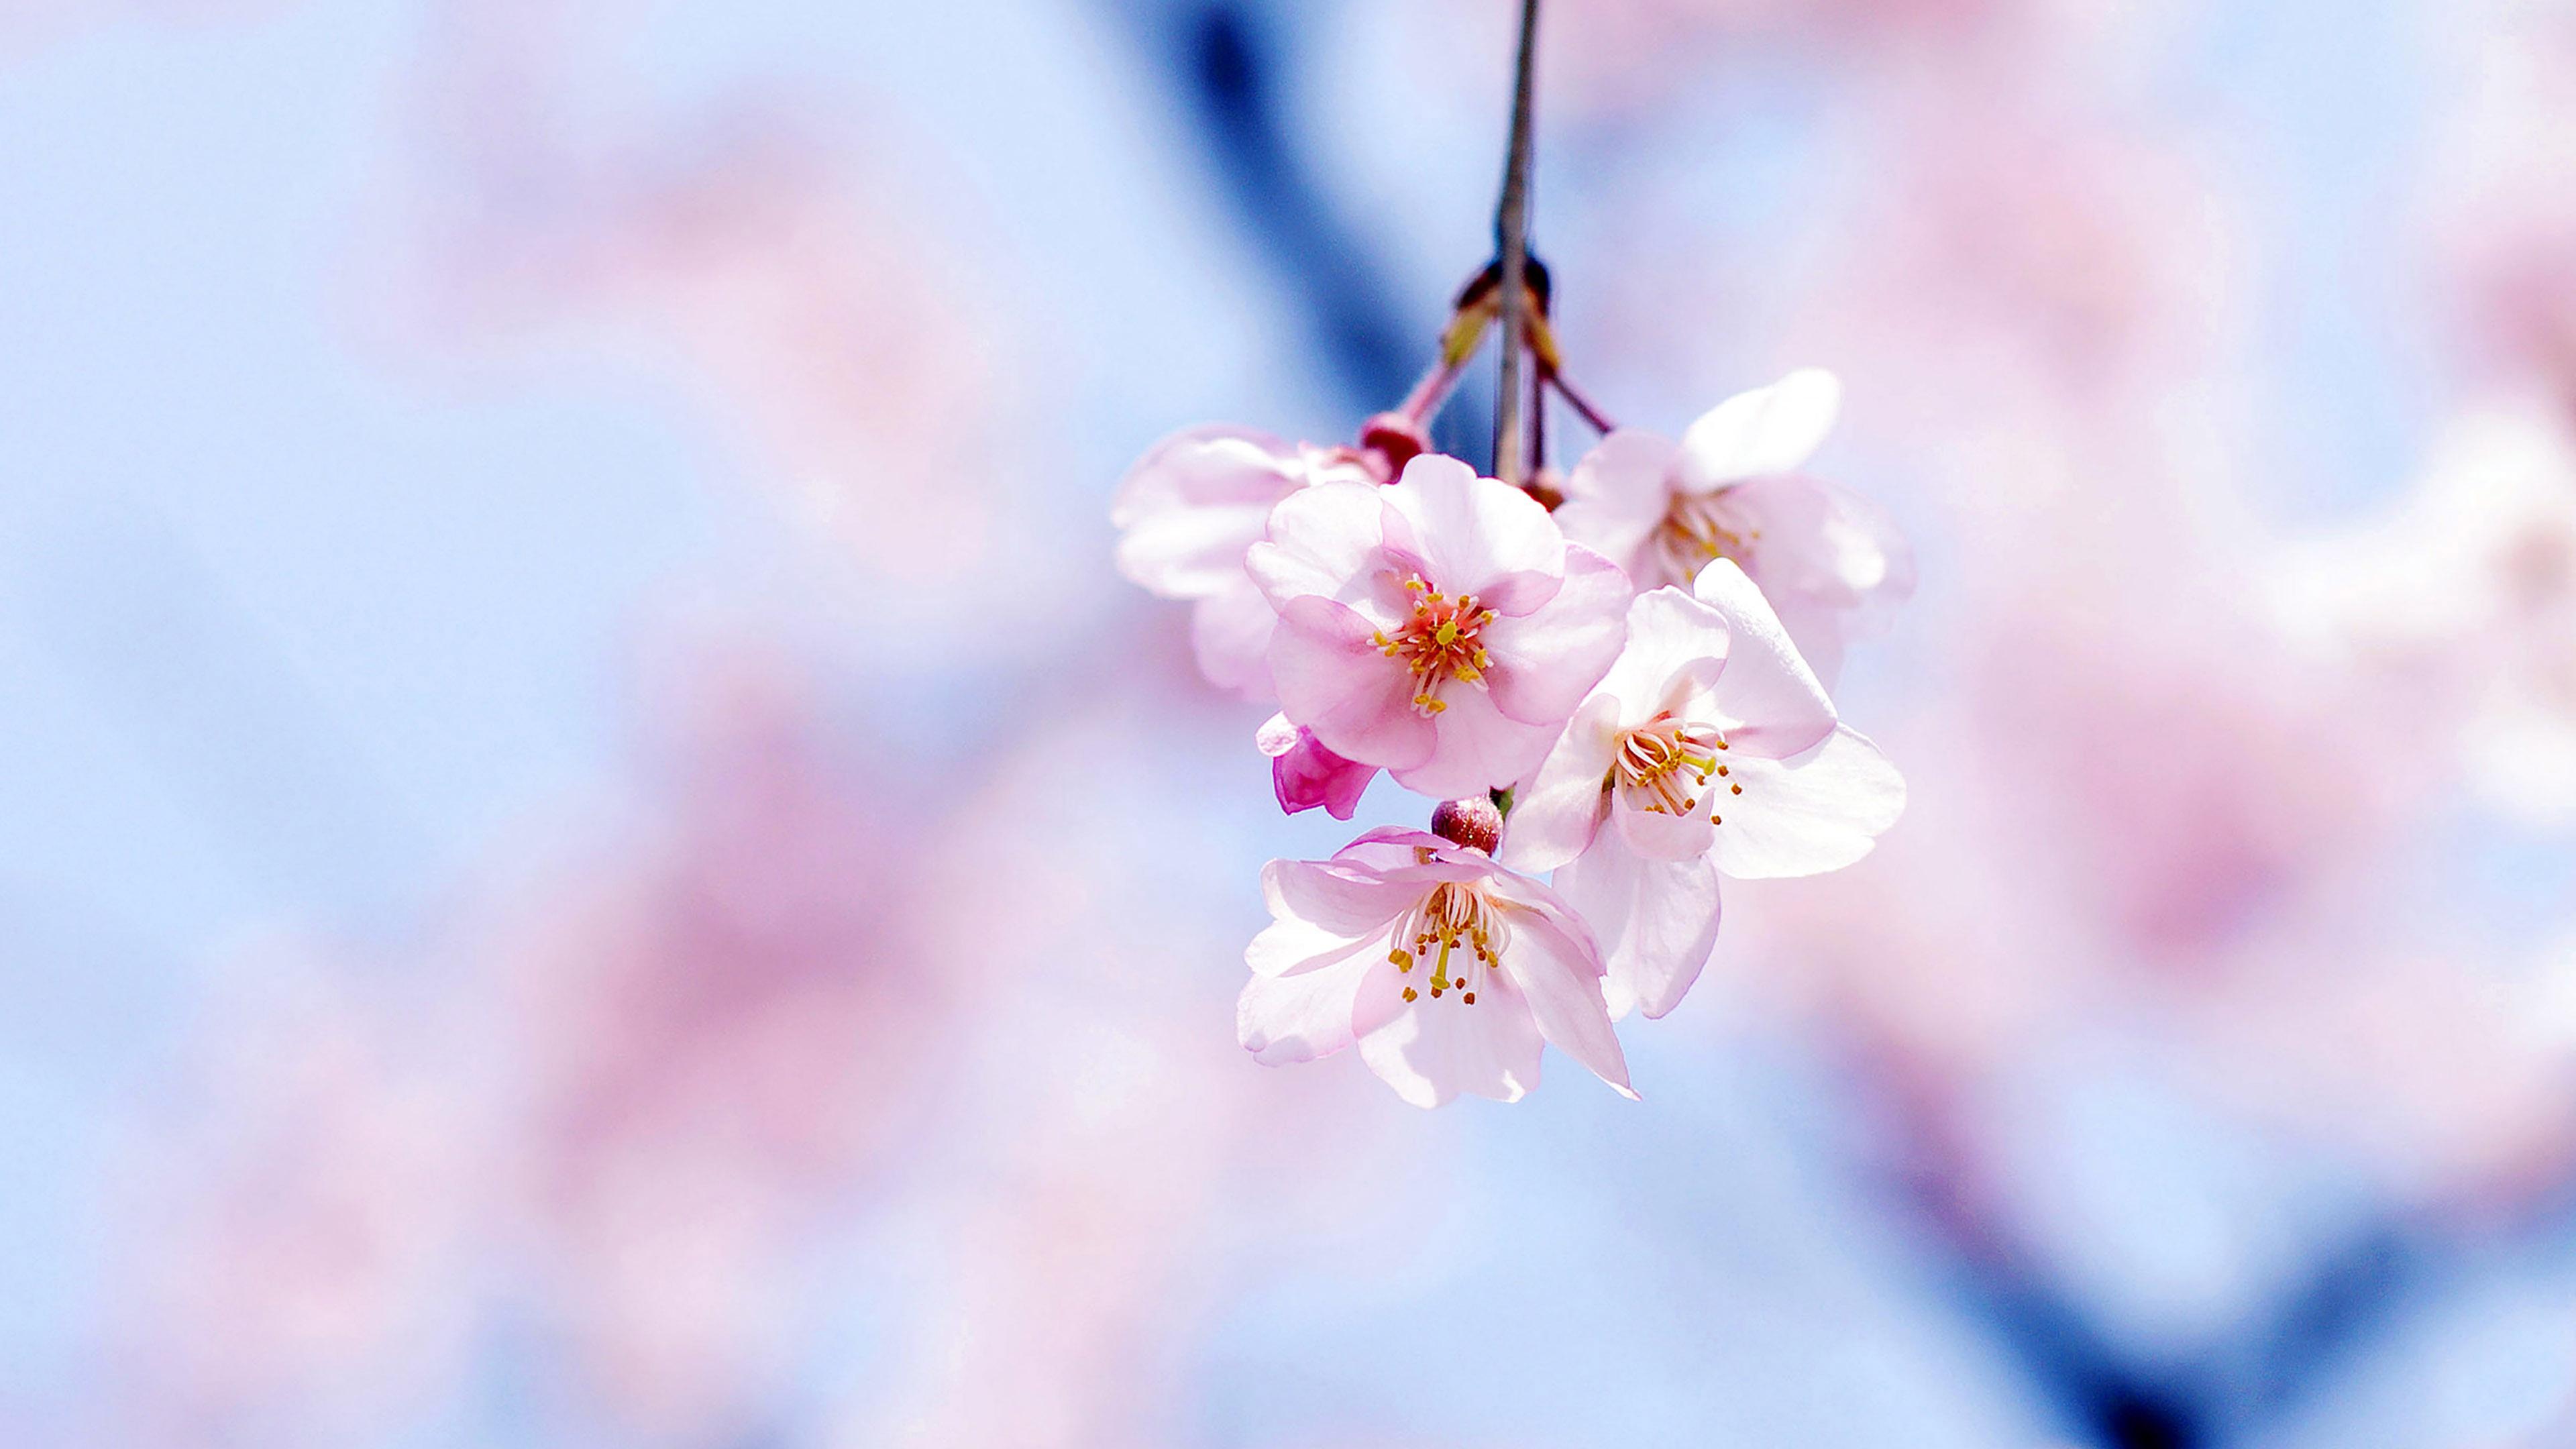 Mc89-wallpaper-cherry-blossom-by-gongsateam-flower